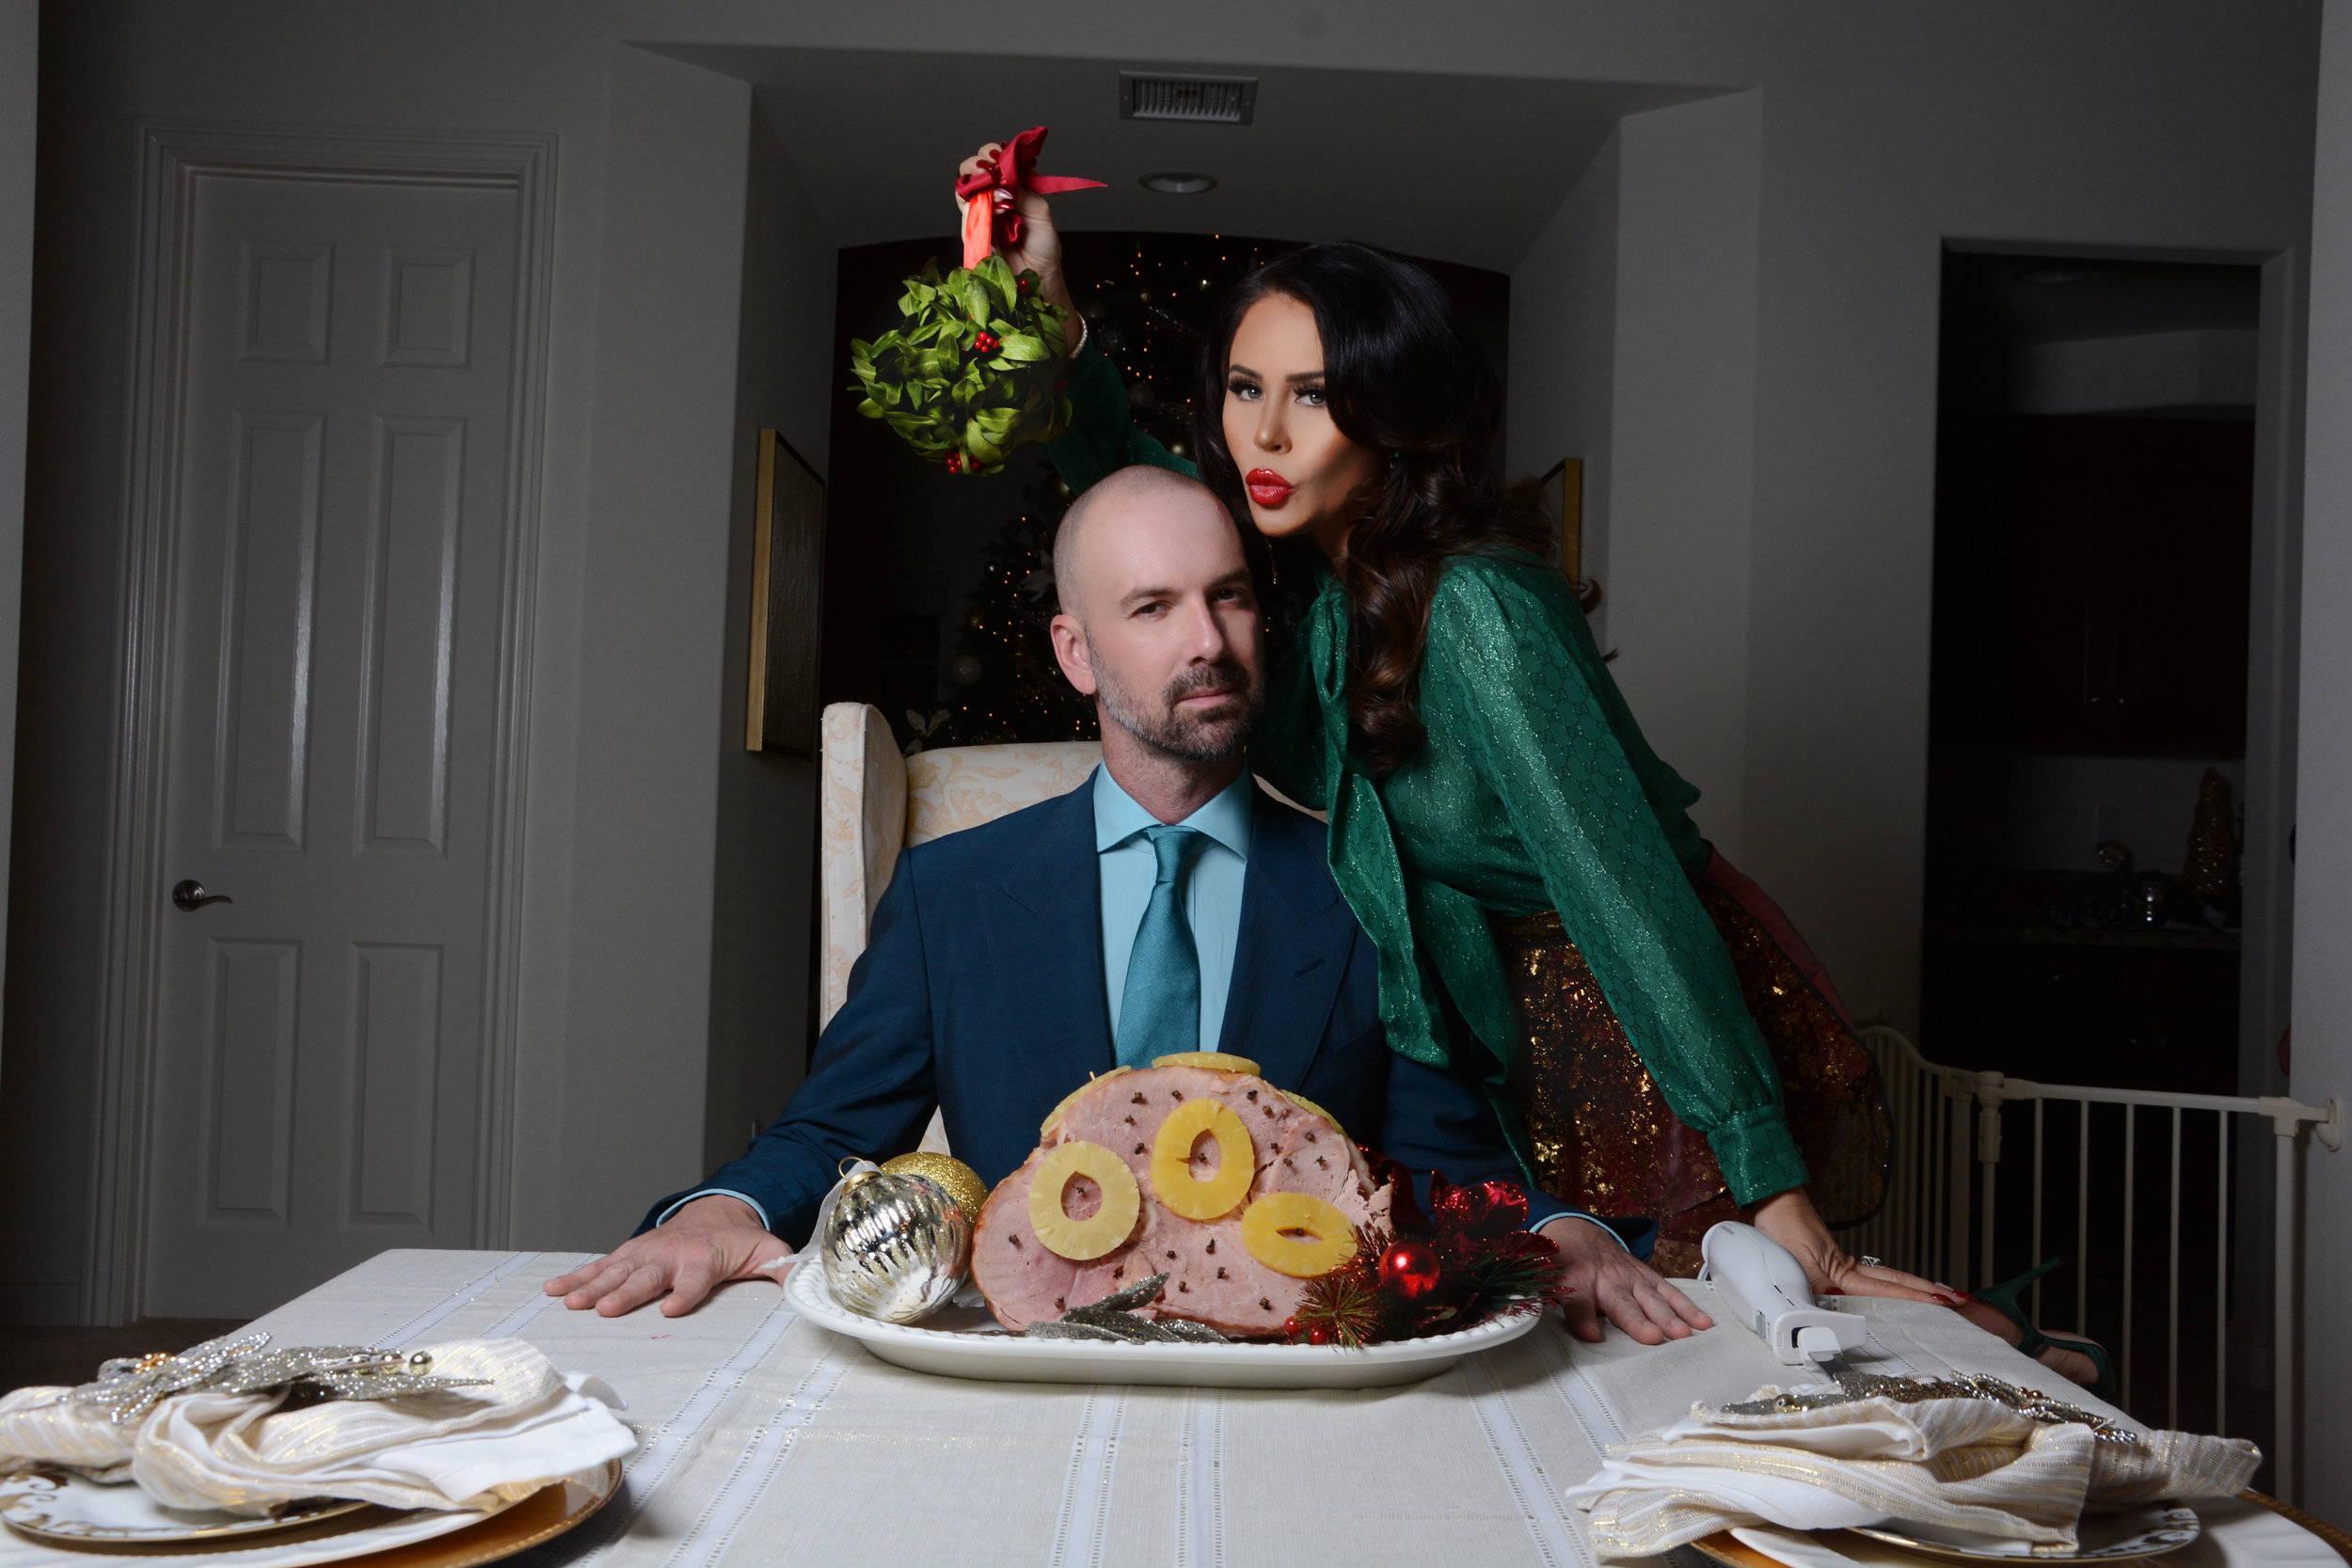 Dr. 巴尔查克和丽亚在槲寄生下吃圣诞火腿